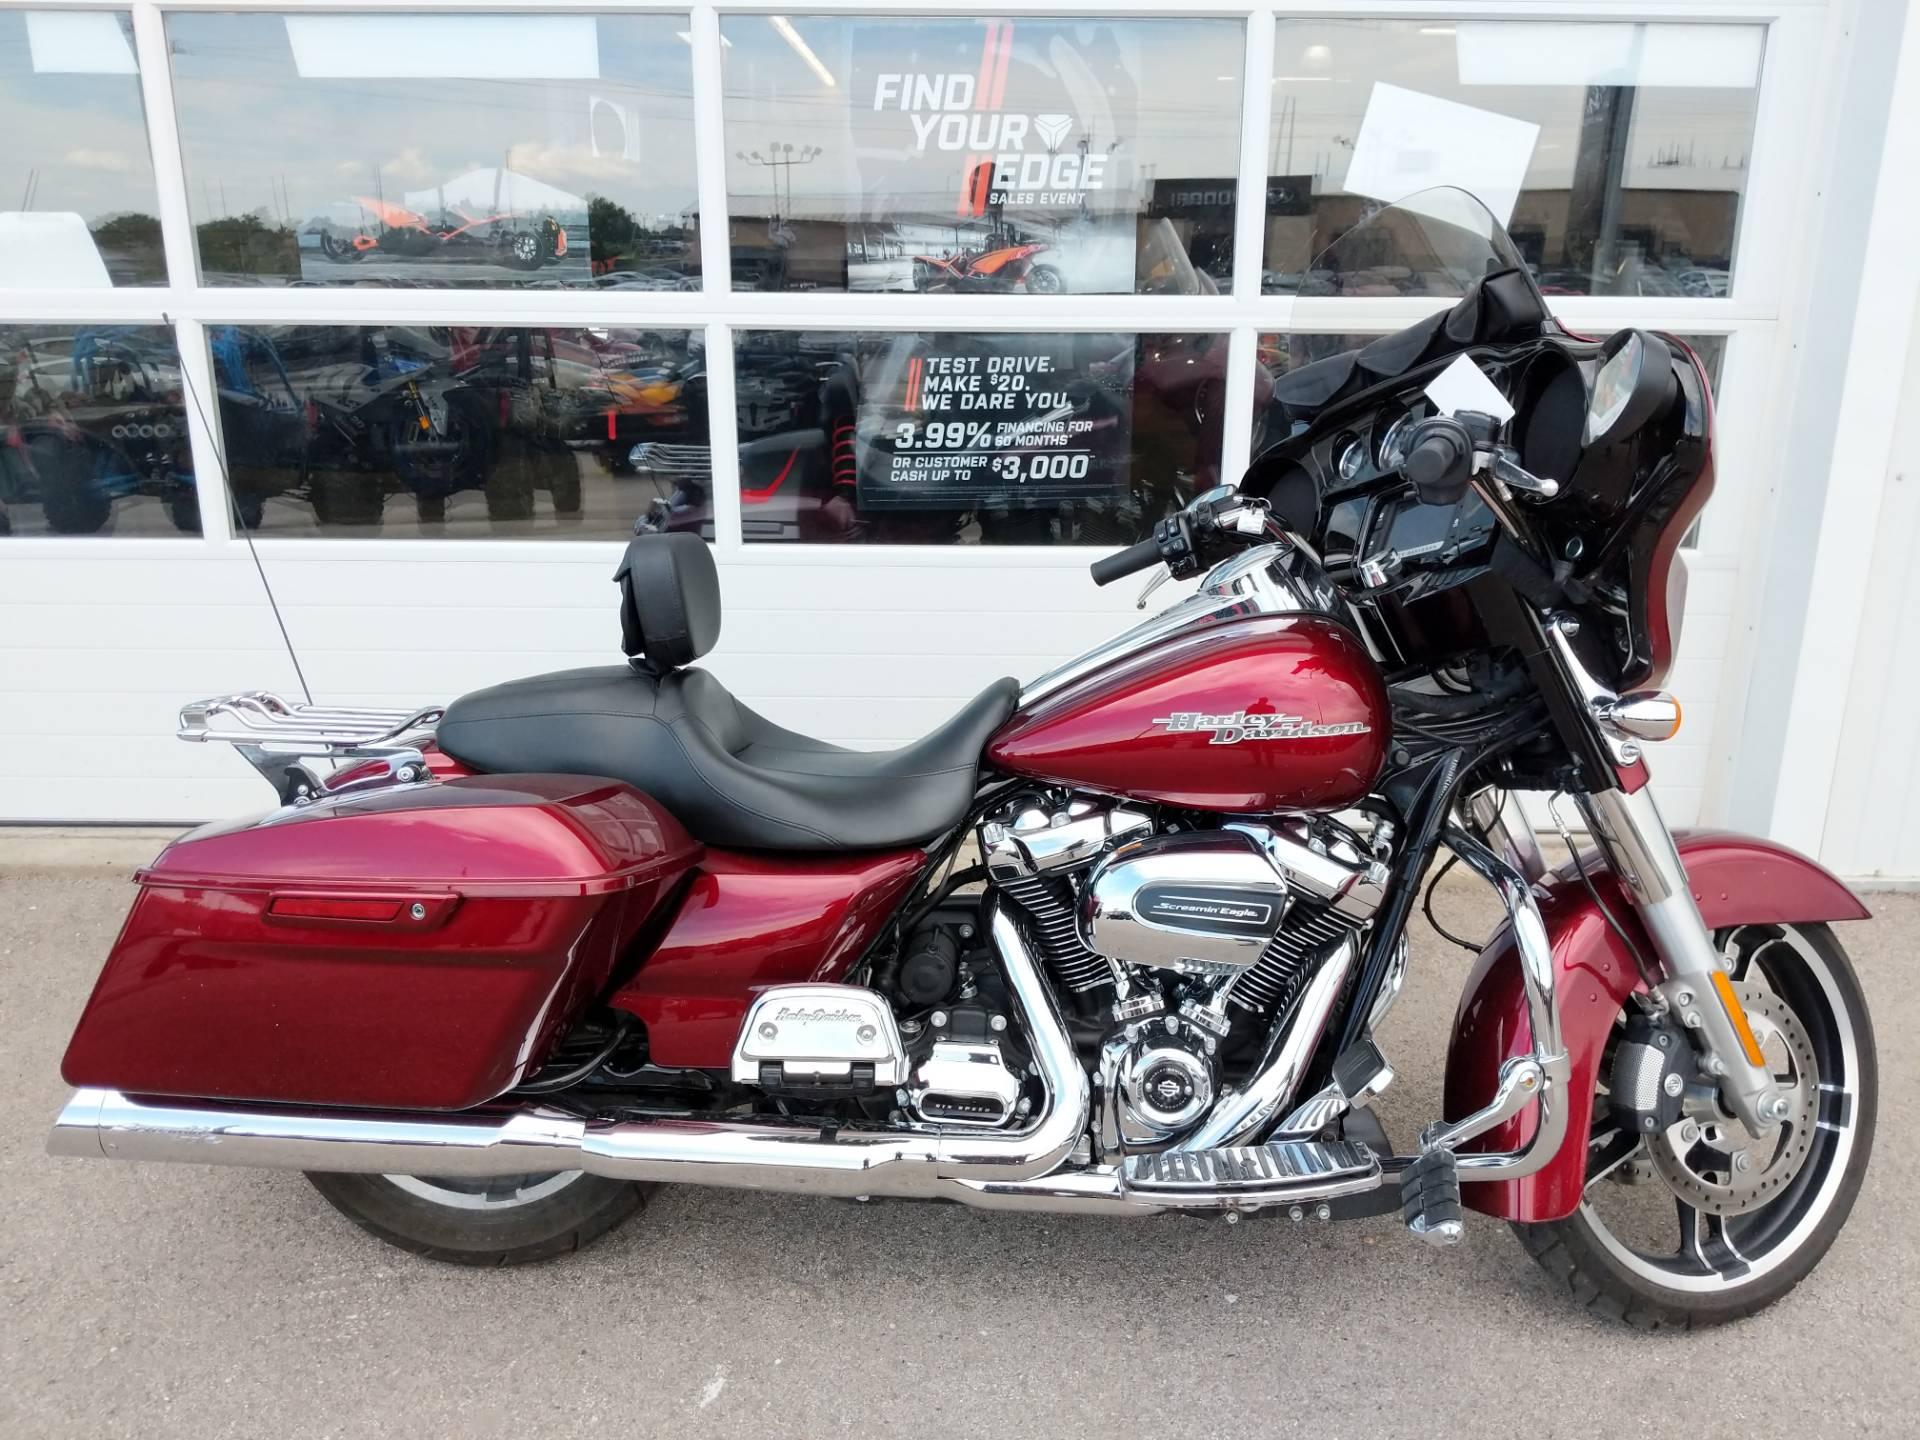 2017 Harley Davidson Street Glide Special In Rapid City South Dakota